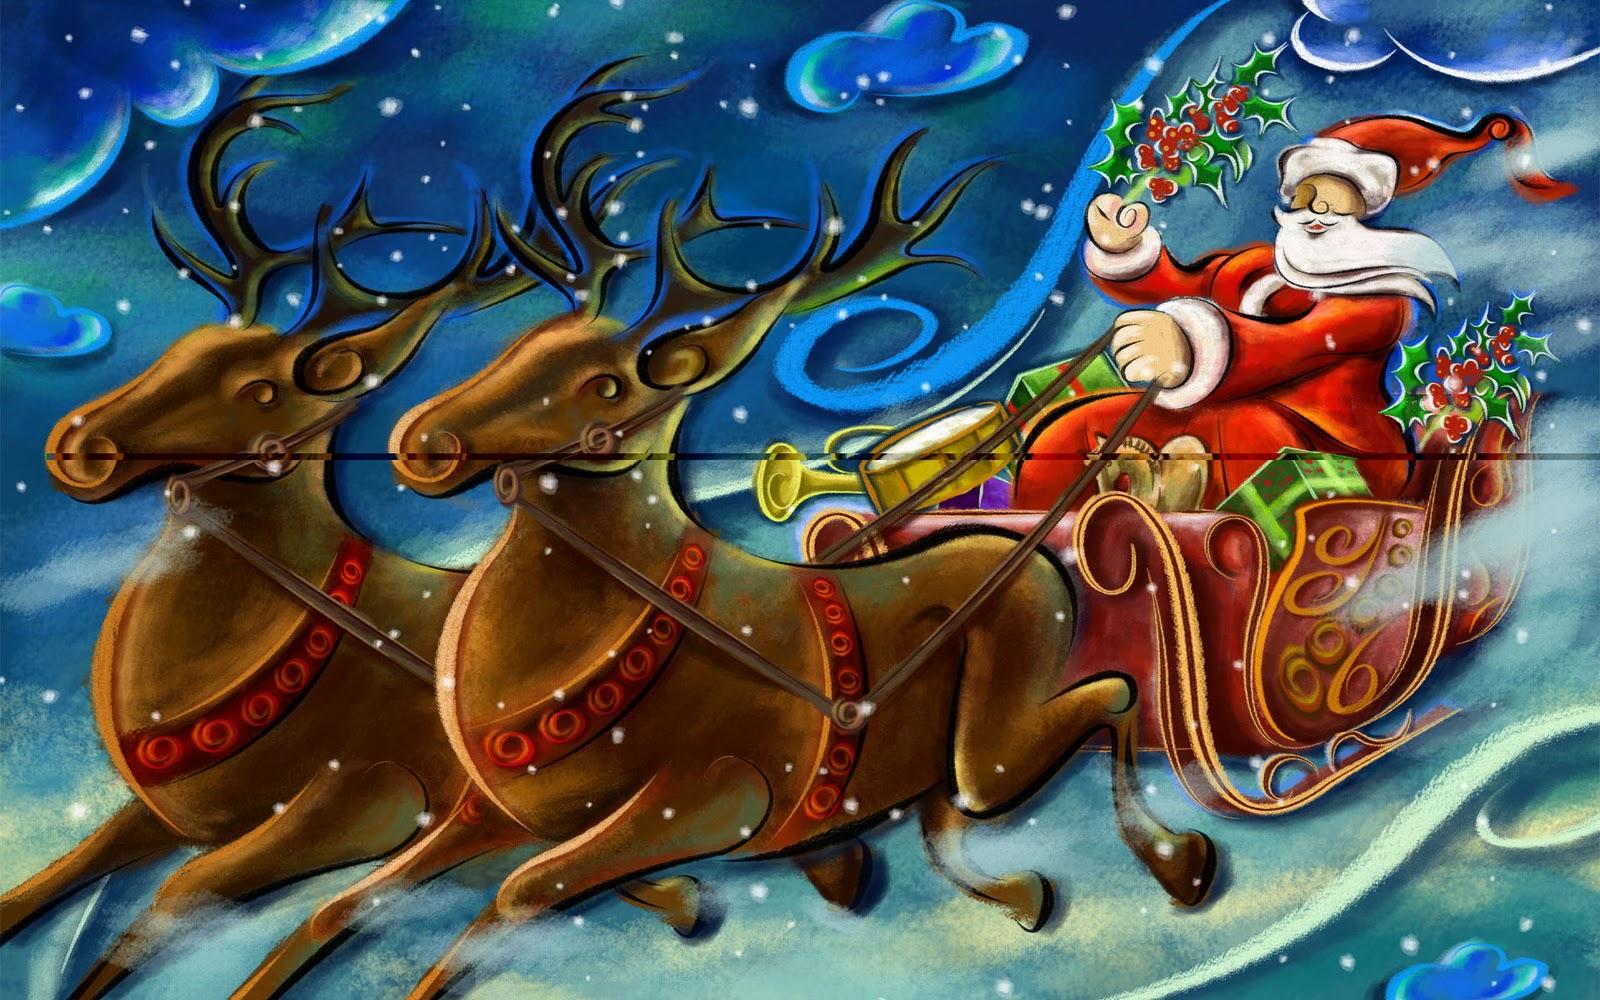 http://1.bp.blogspot.com/-sckTCAua4cE/TugpRr-_nII/AAAAAAAAAhc/bmAMnyXA3tE/s1600/santa_clause_creative_art_work-wide.jpg